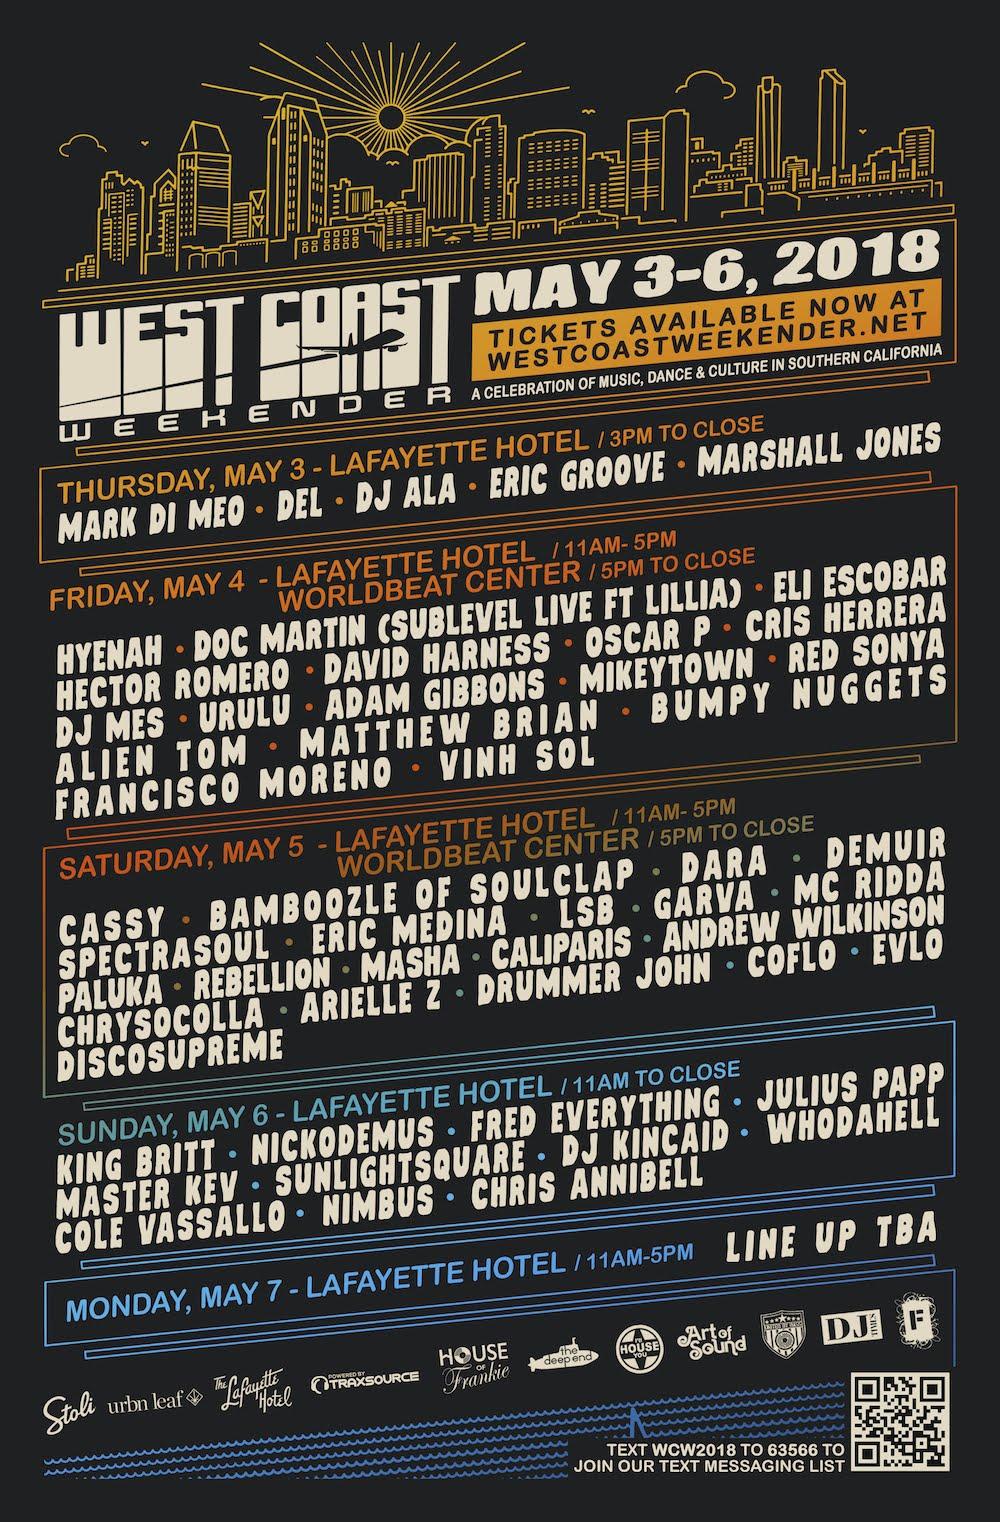 West Coast Weekender 2018 Lineup | EDM Identity